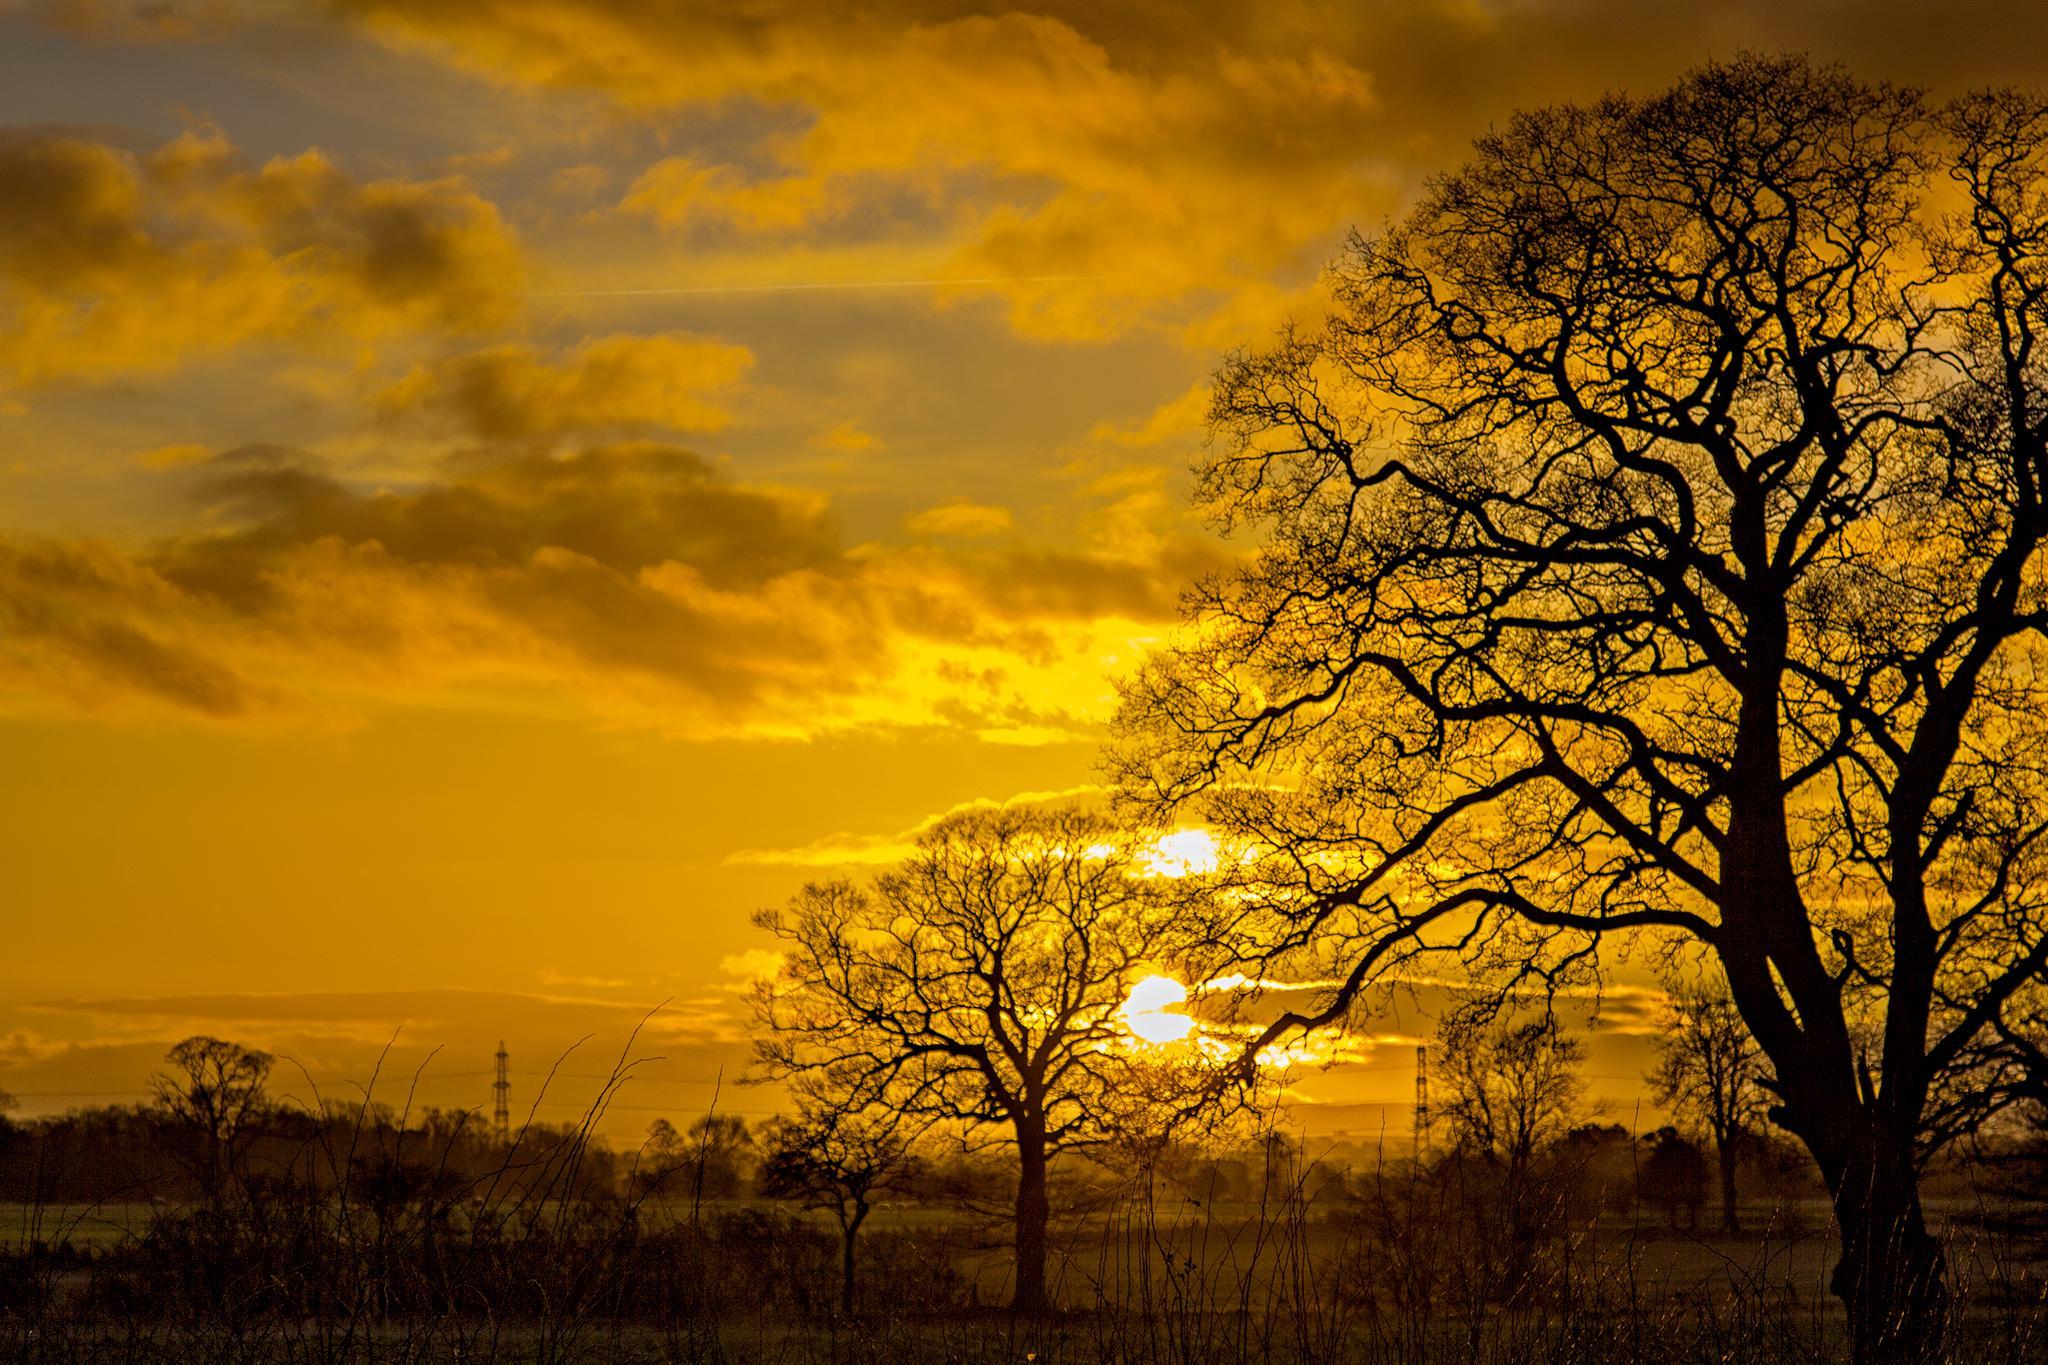 Yellow Sunset by Tony Shaw